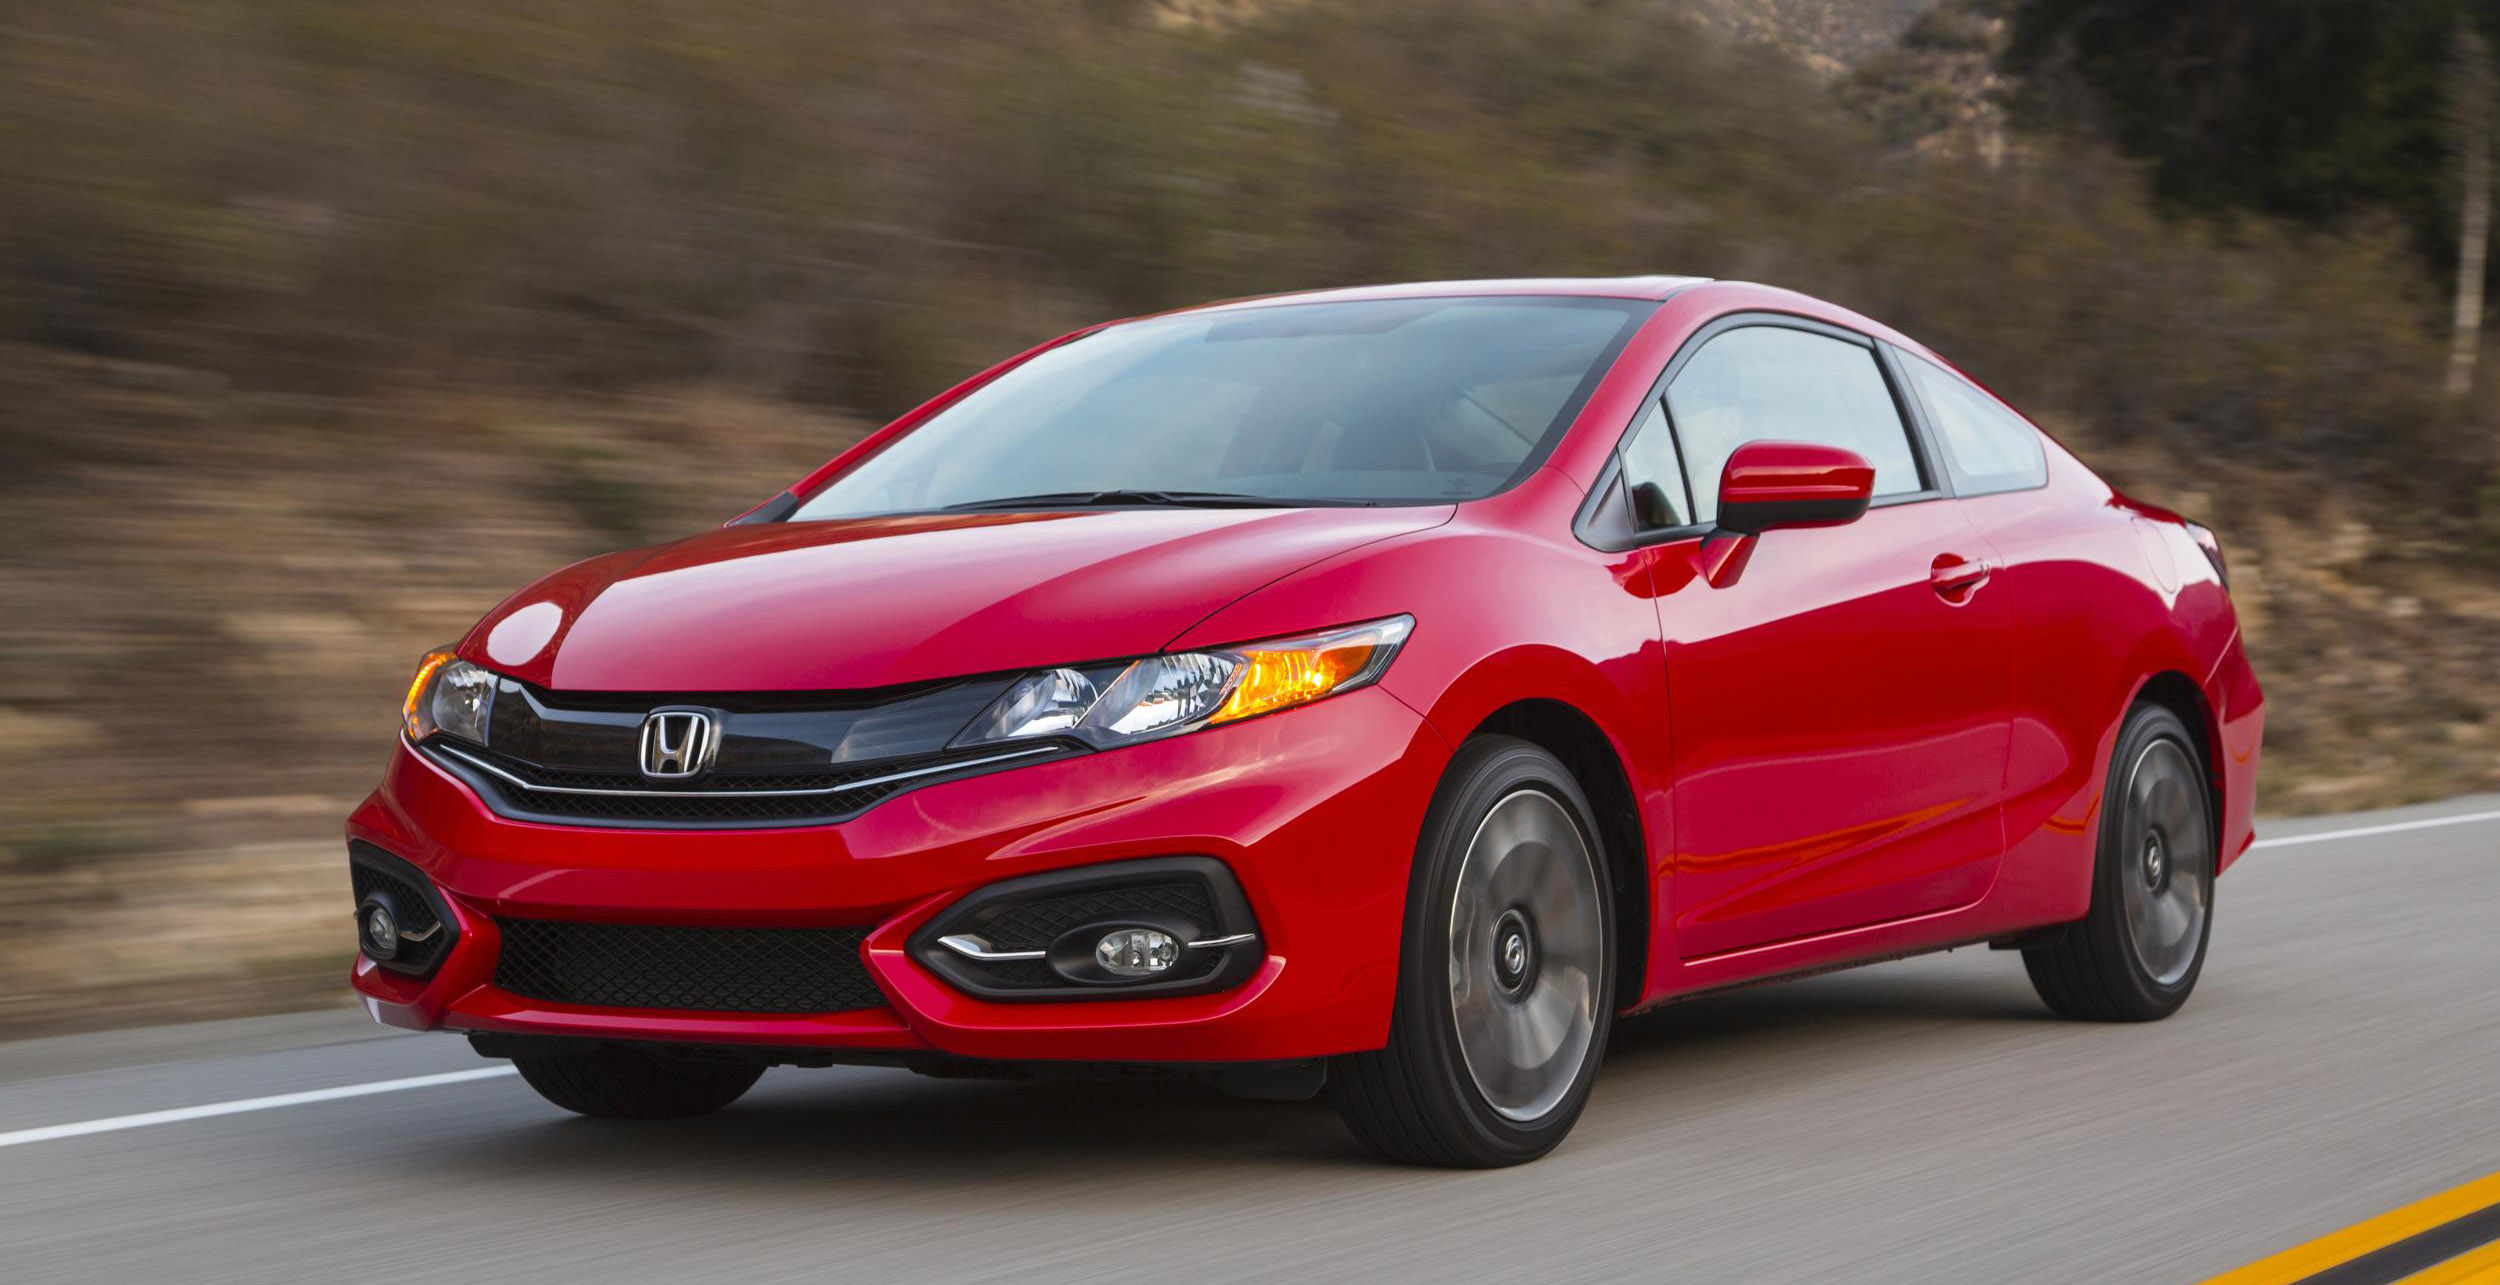 Honda Certified Preowned Vs Used  Hamilton Honda Blog